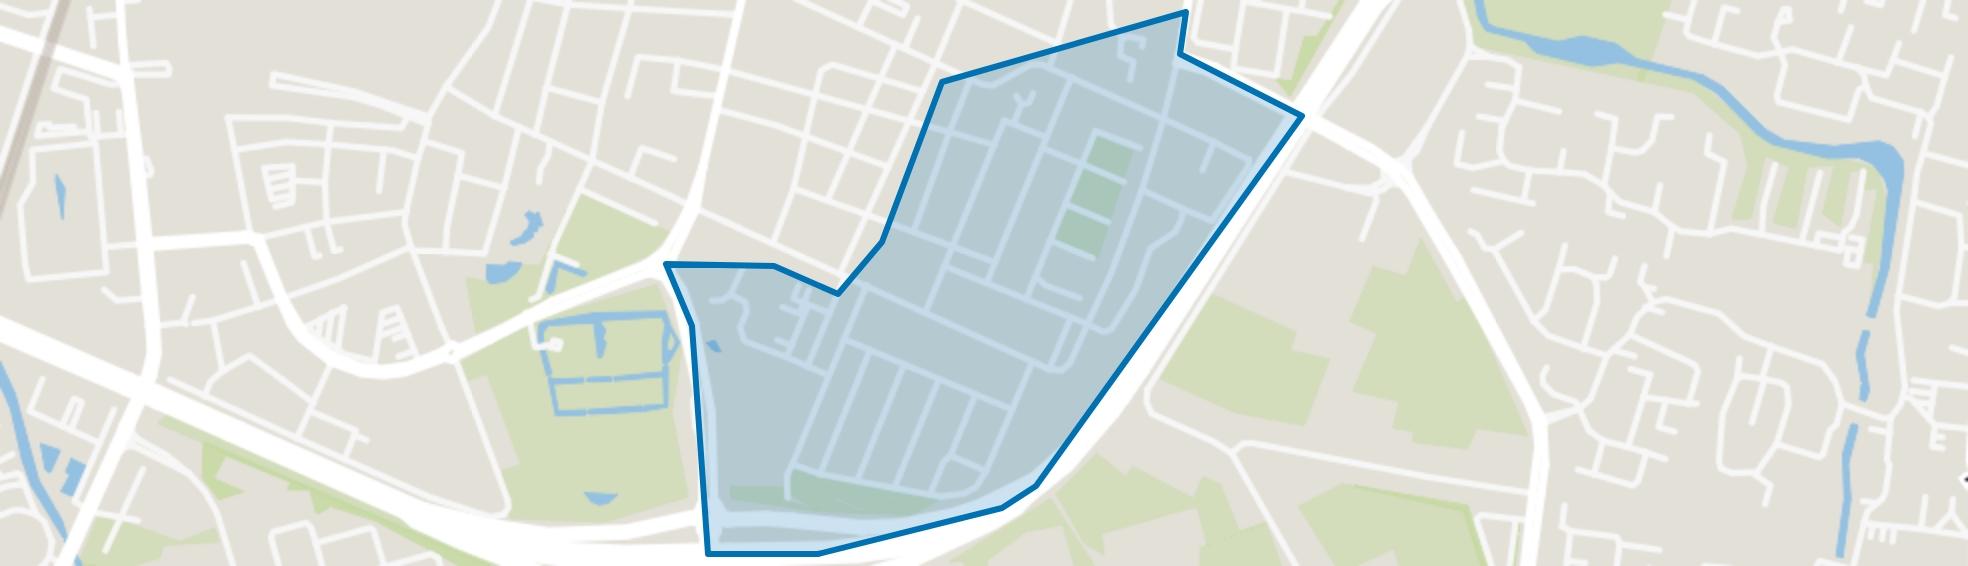 Keijenburg, Roosendaal map